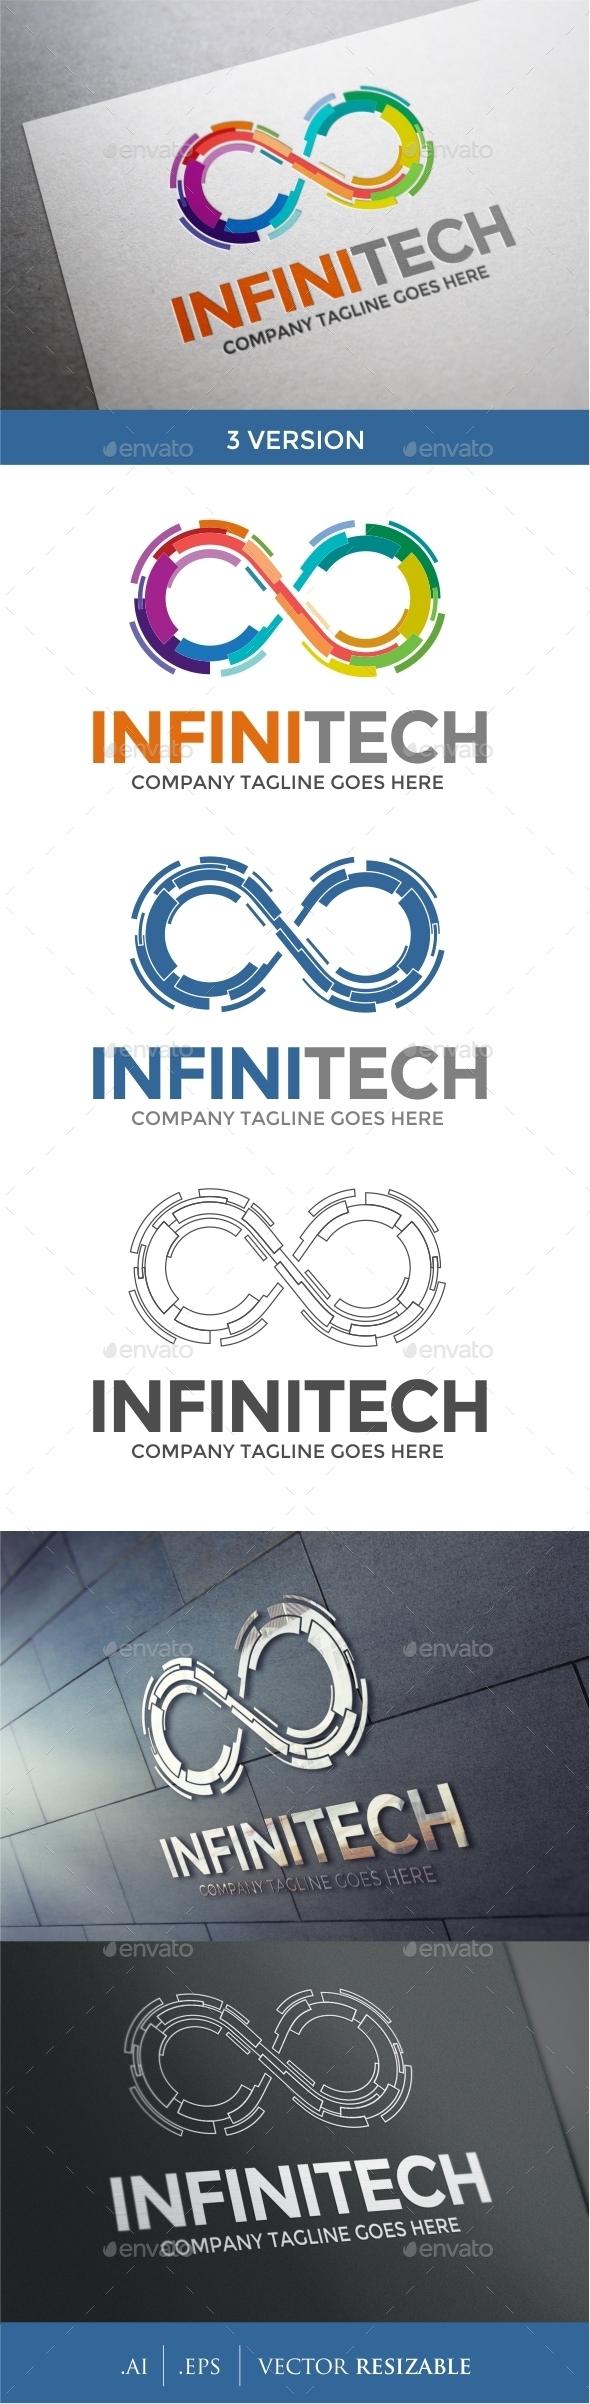 Infinity Logo Template - Abstract Logo Templates